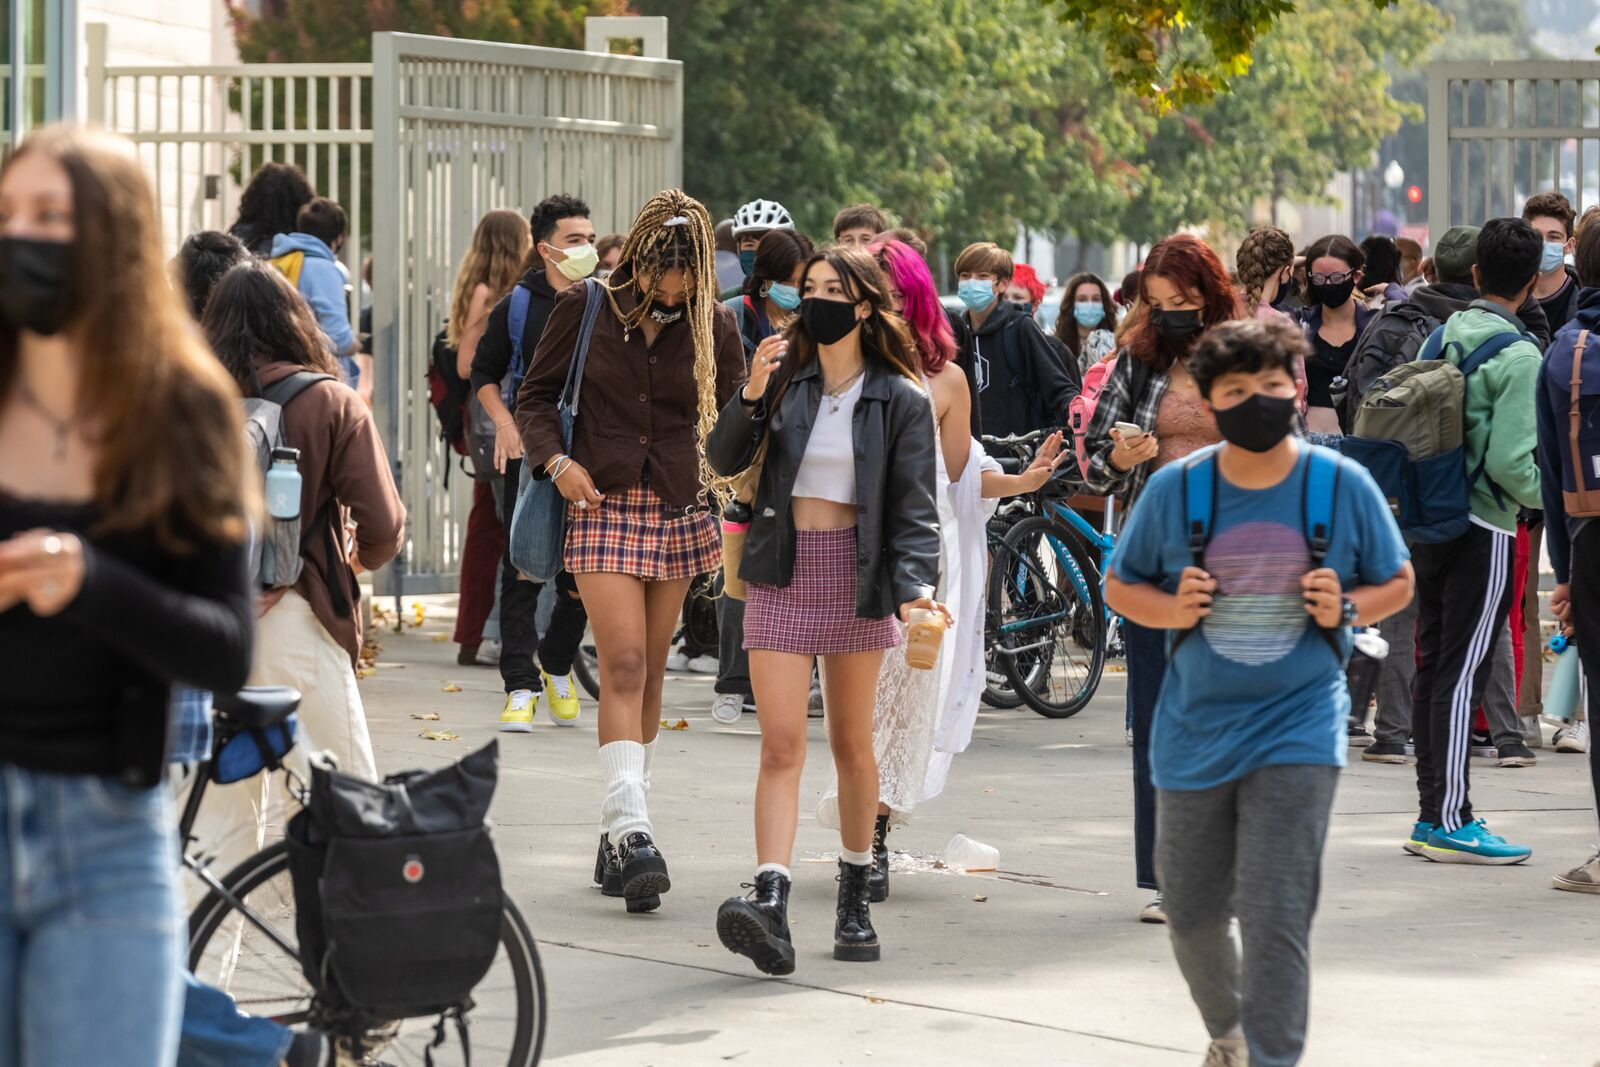 Berkeley High School students arrive on campus on August 16, 2021. Credit: Kelly Sullivan